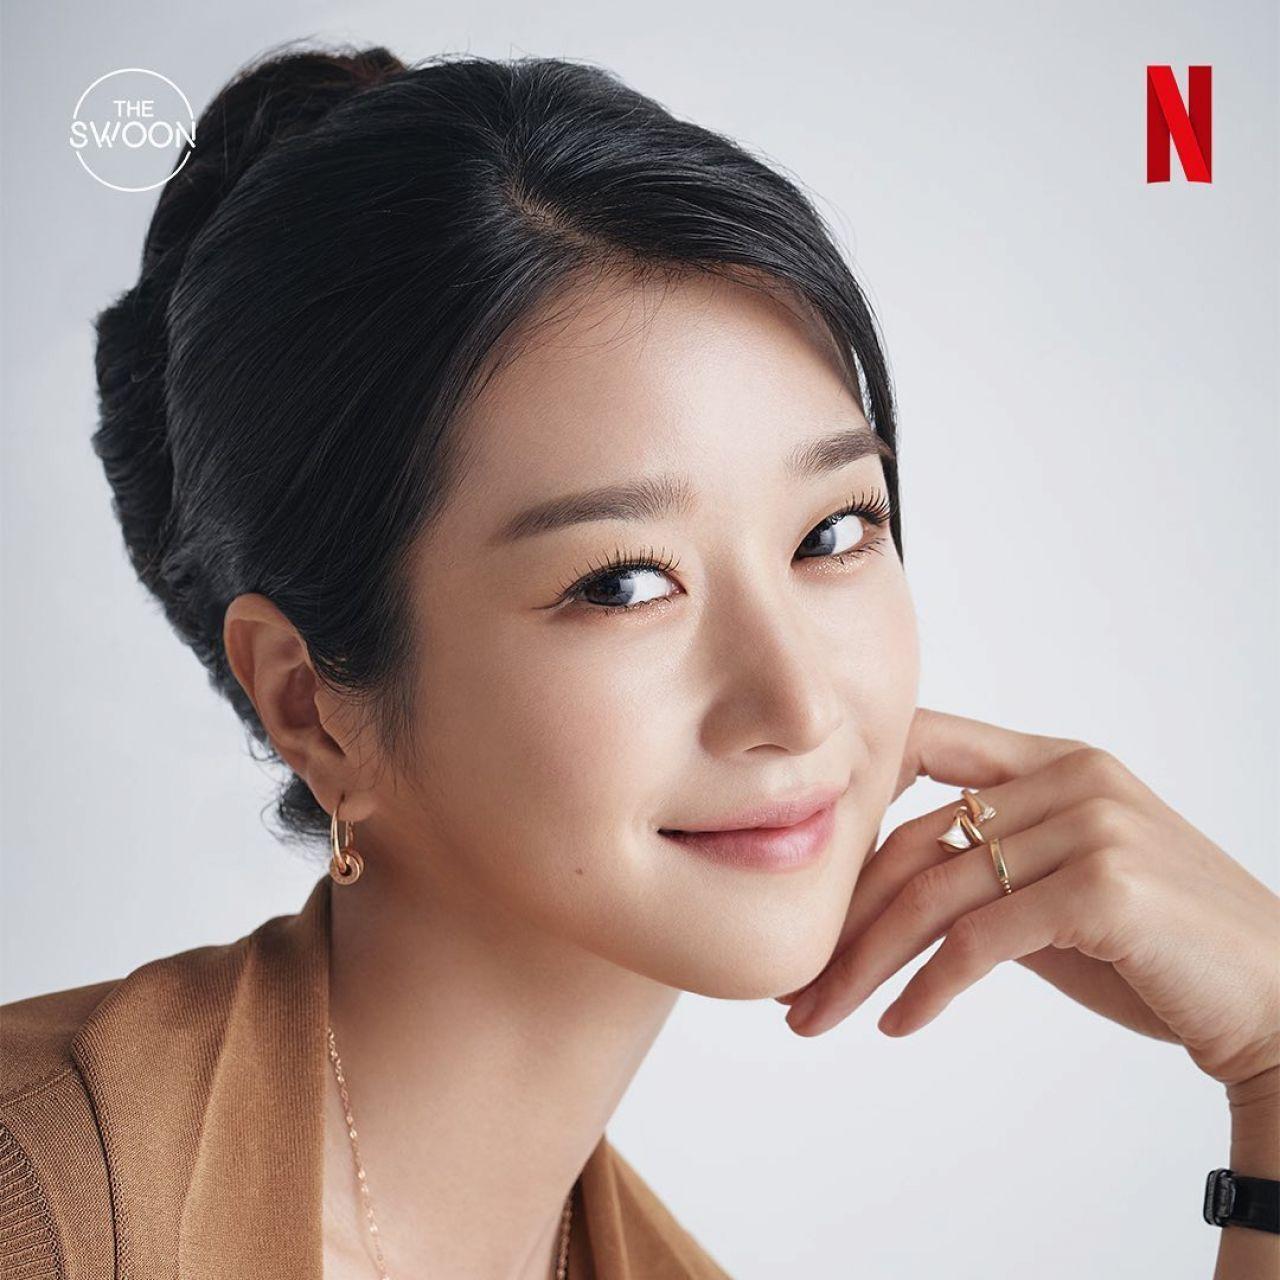 seo-ye-ji-kim-soo-hyun-photoshoot-for-netflix-2020-1.jpg